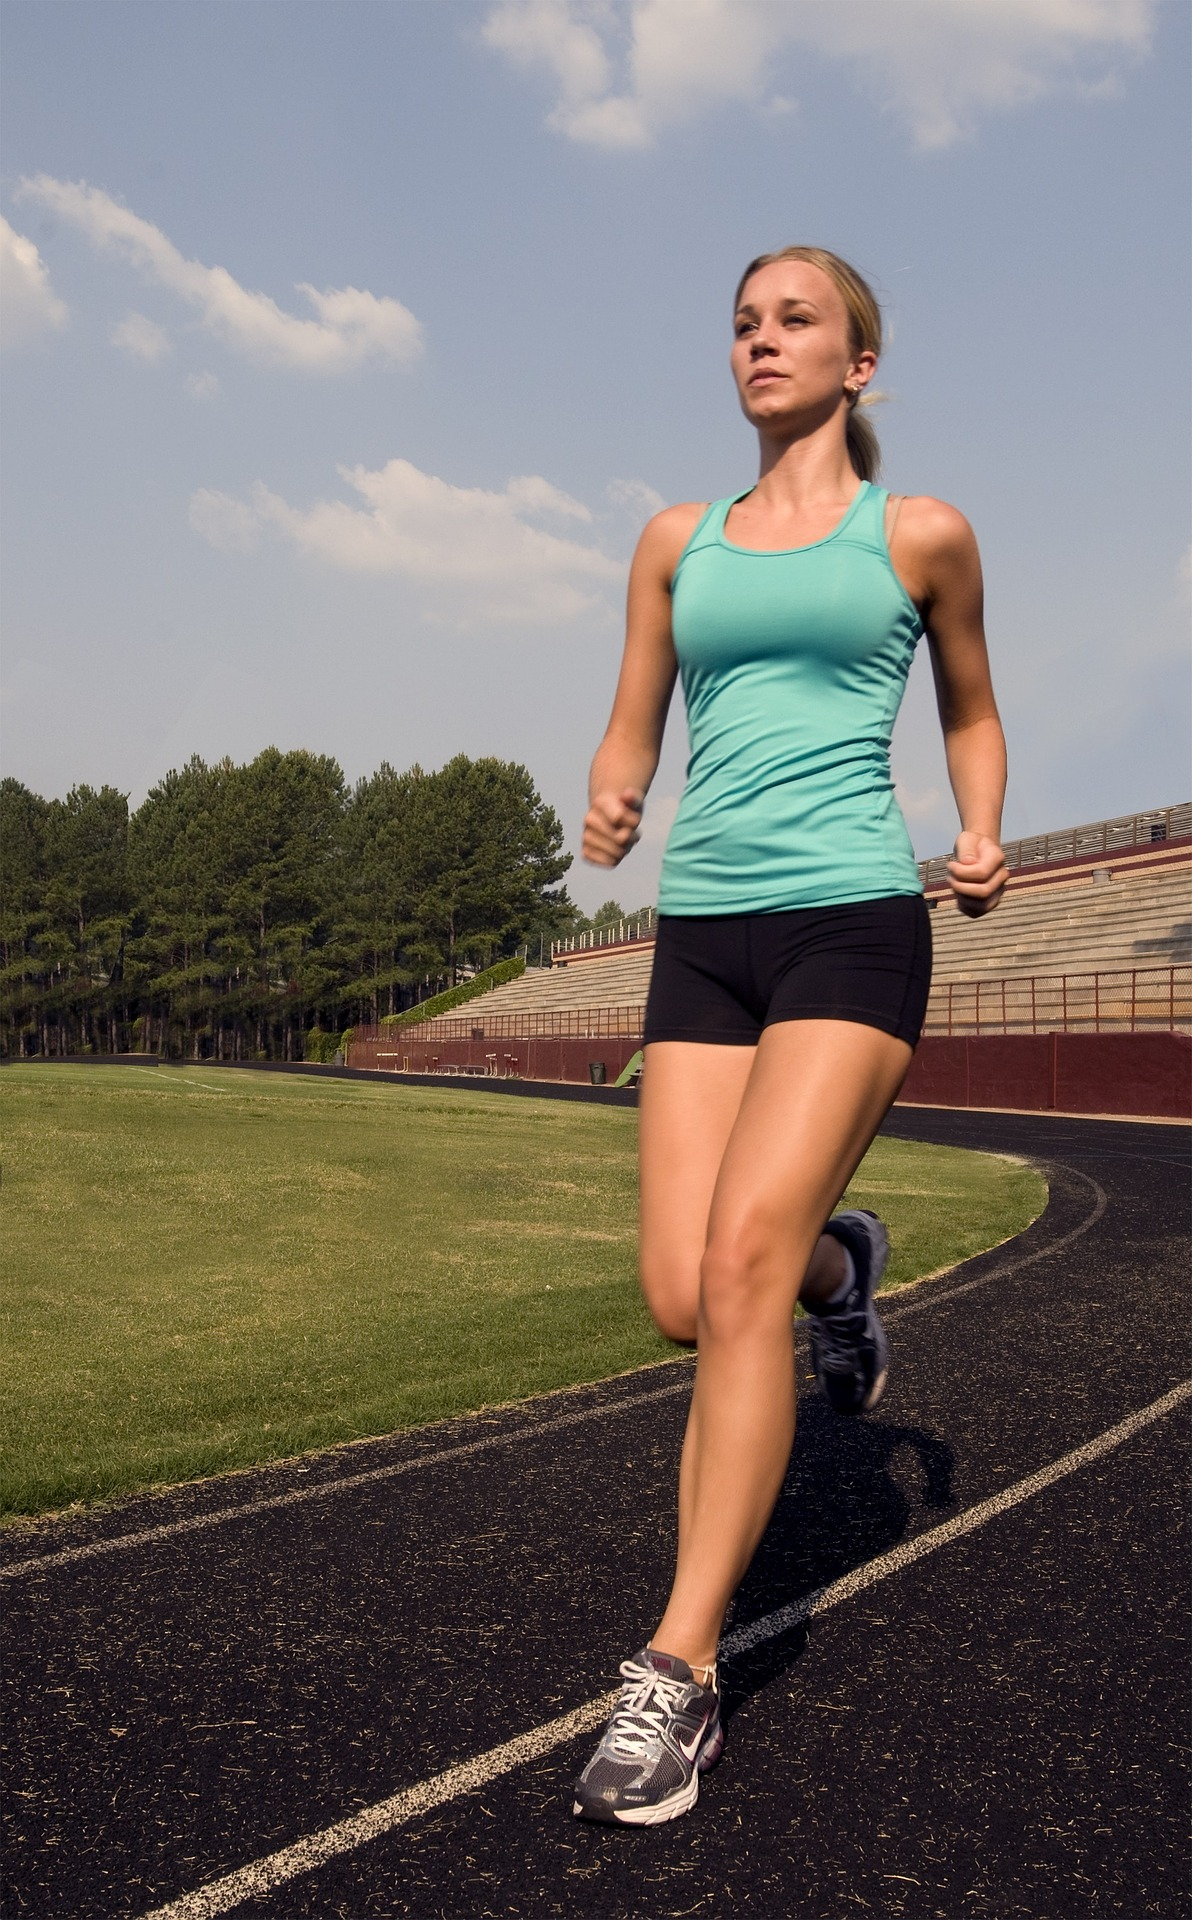 Nike Free RN 5.0 : test, avis et meilleur prix ! – Chaussure